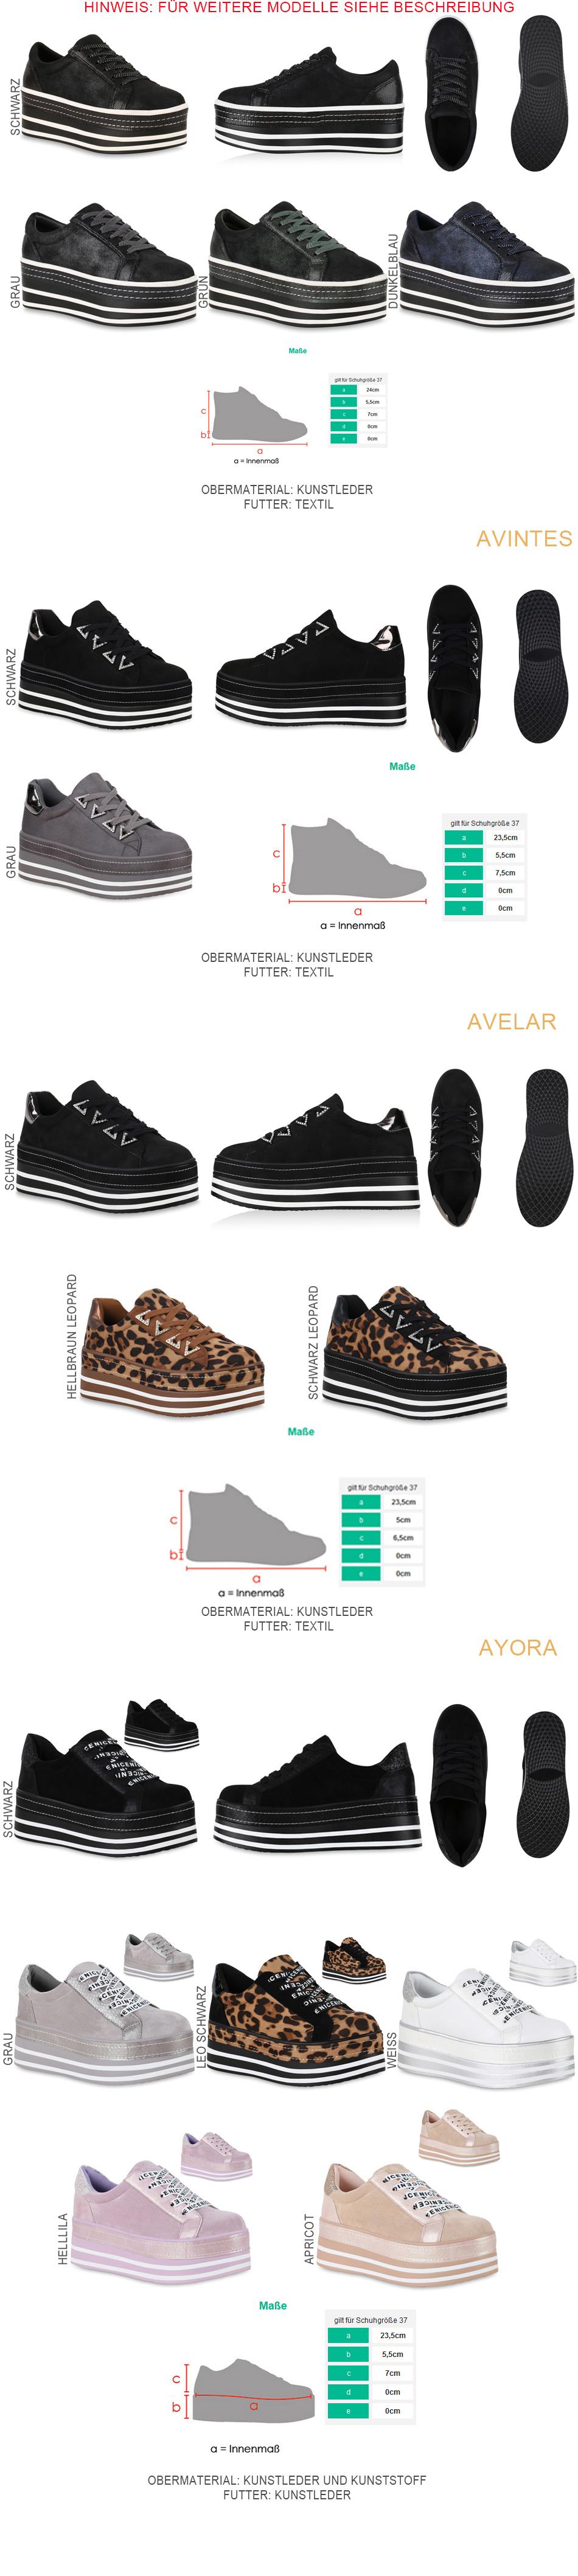 Details zu Damen Plateau Sneaker Glitzer Turnschuhe Schnürer Plateauschuhe 824237 Schuhe